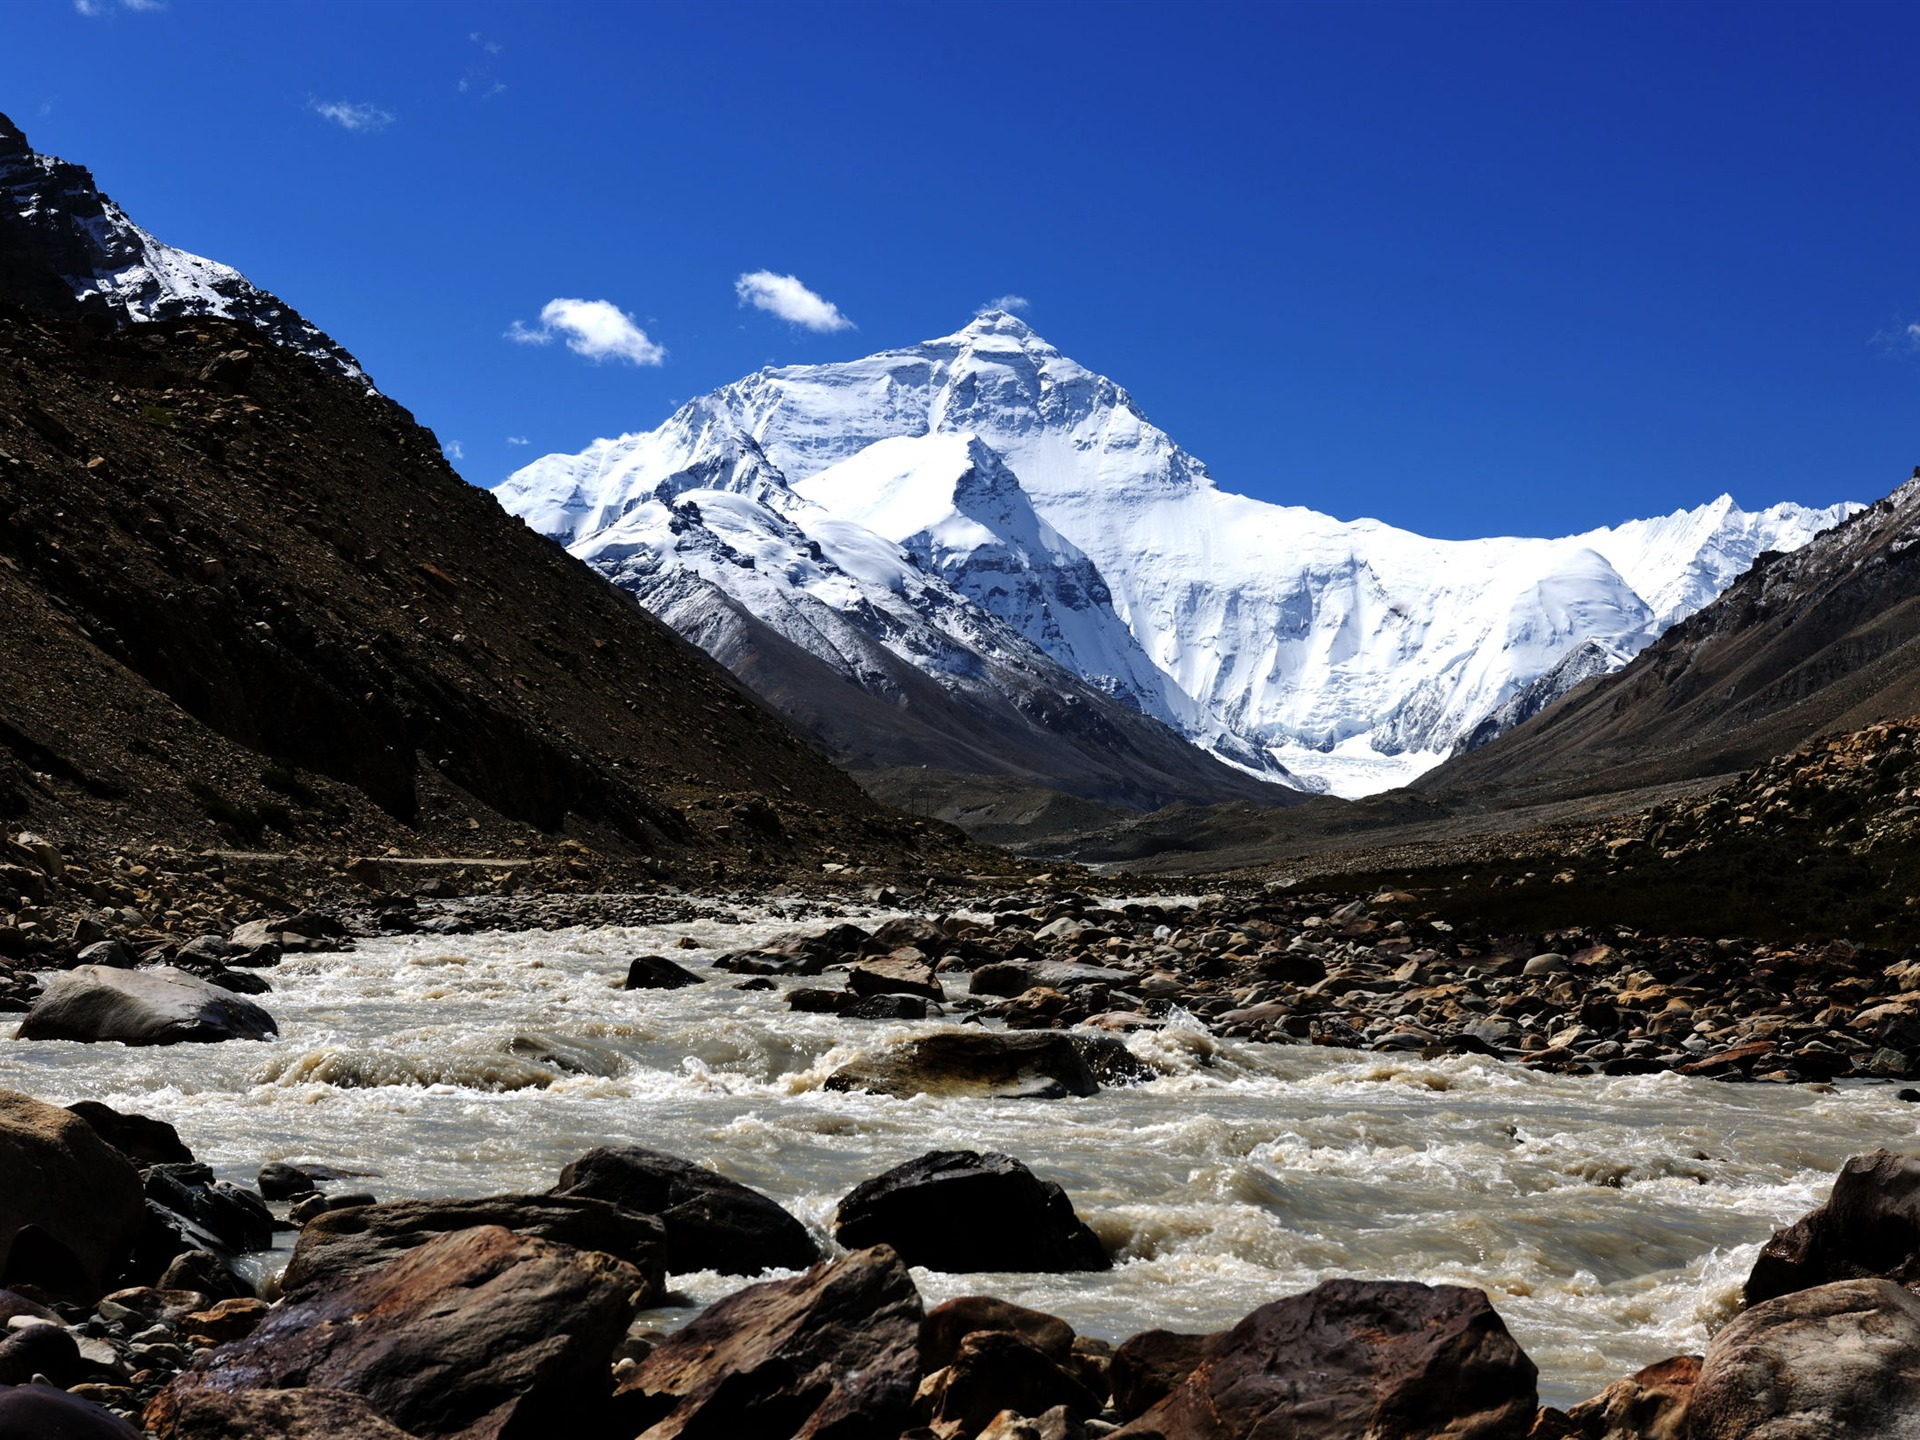 Meilleur Voiture 2018 >> Tibet Everest-Naturel Paysage Fond d'écran Aperçu ...